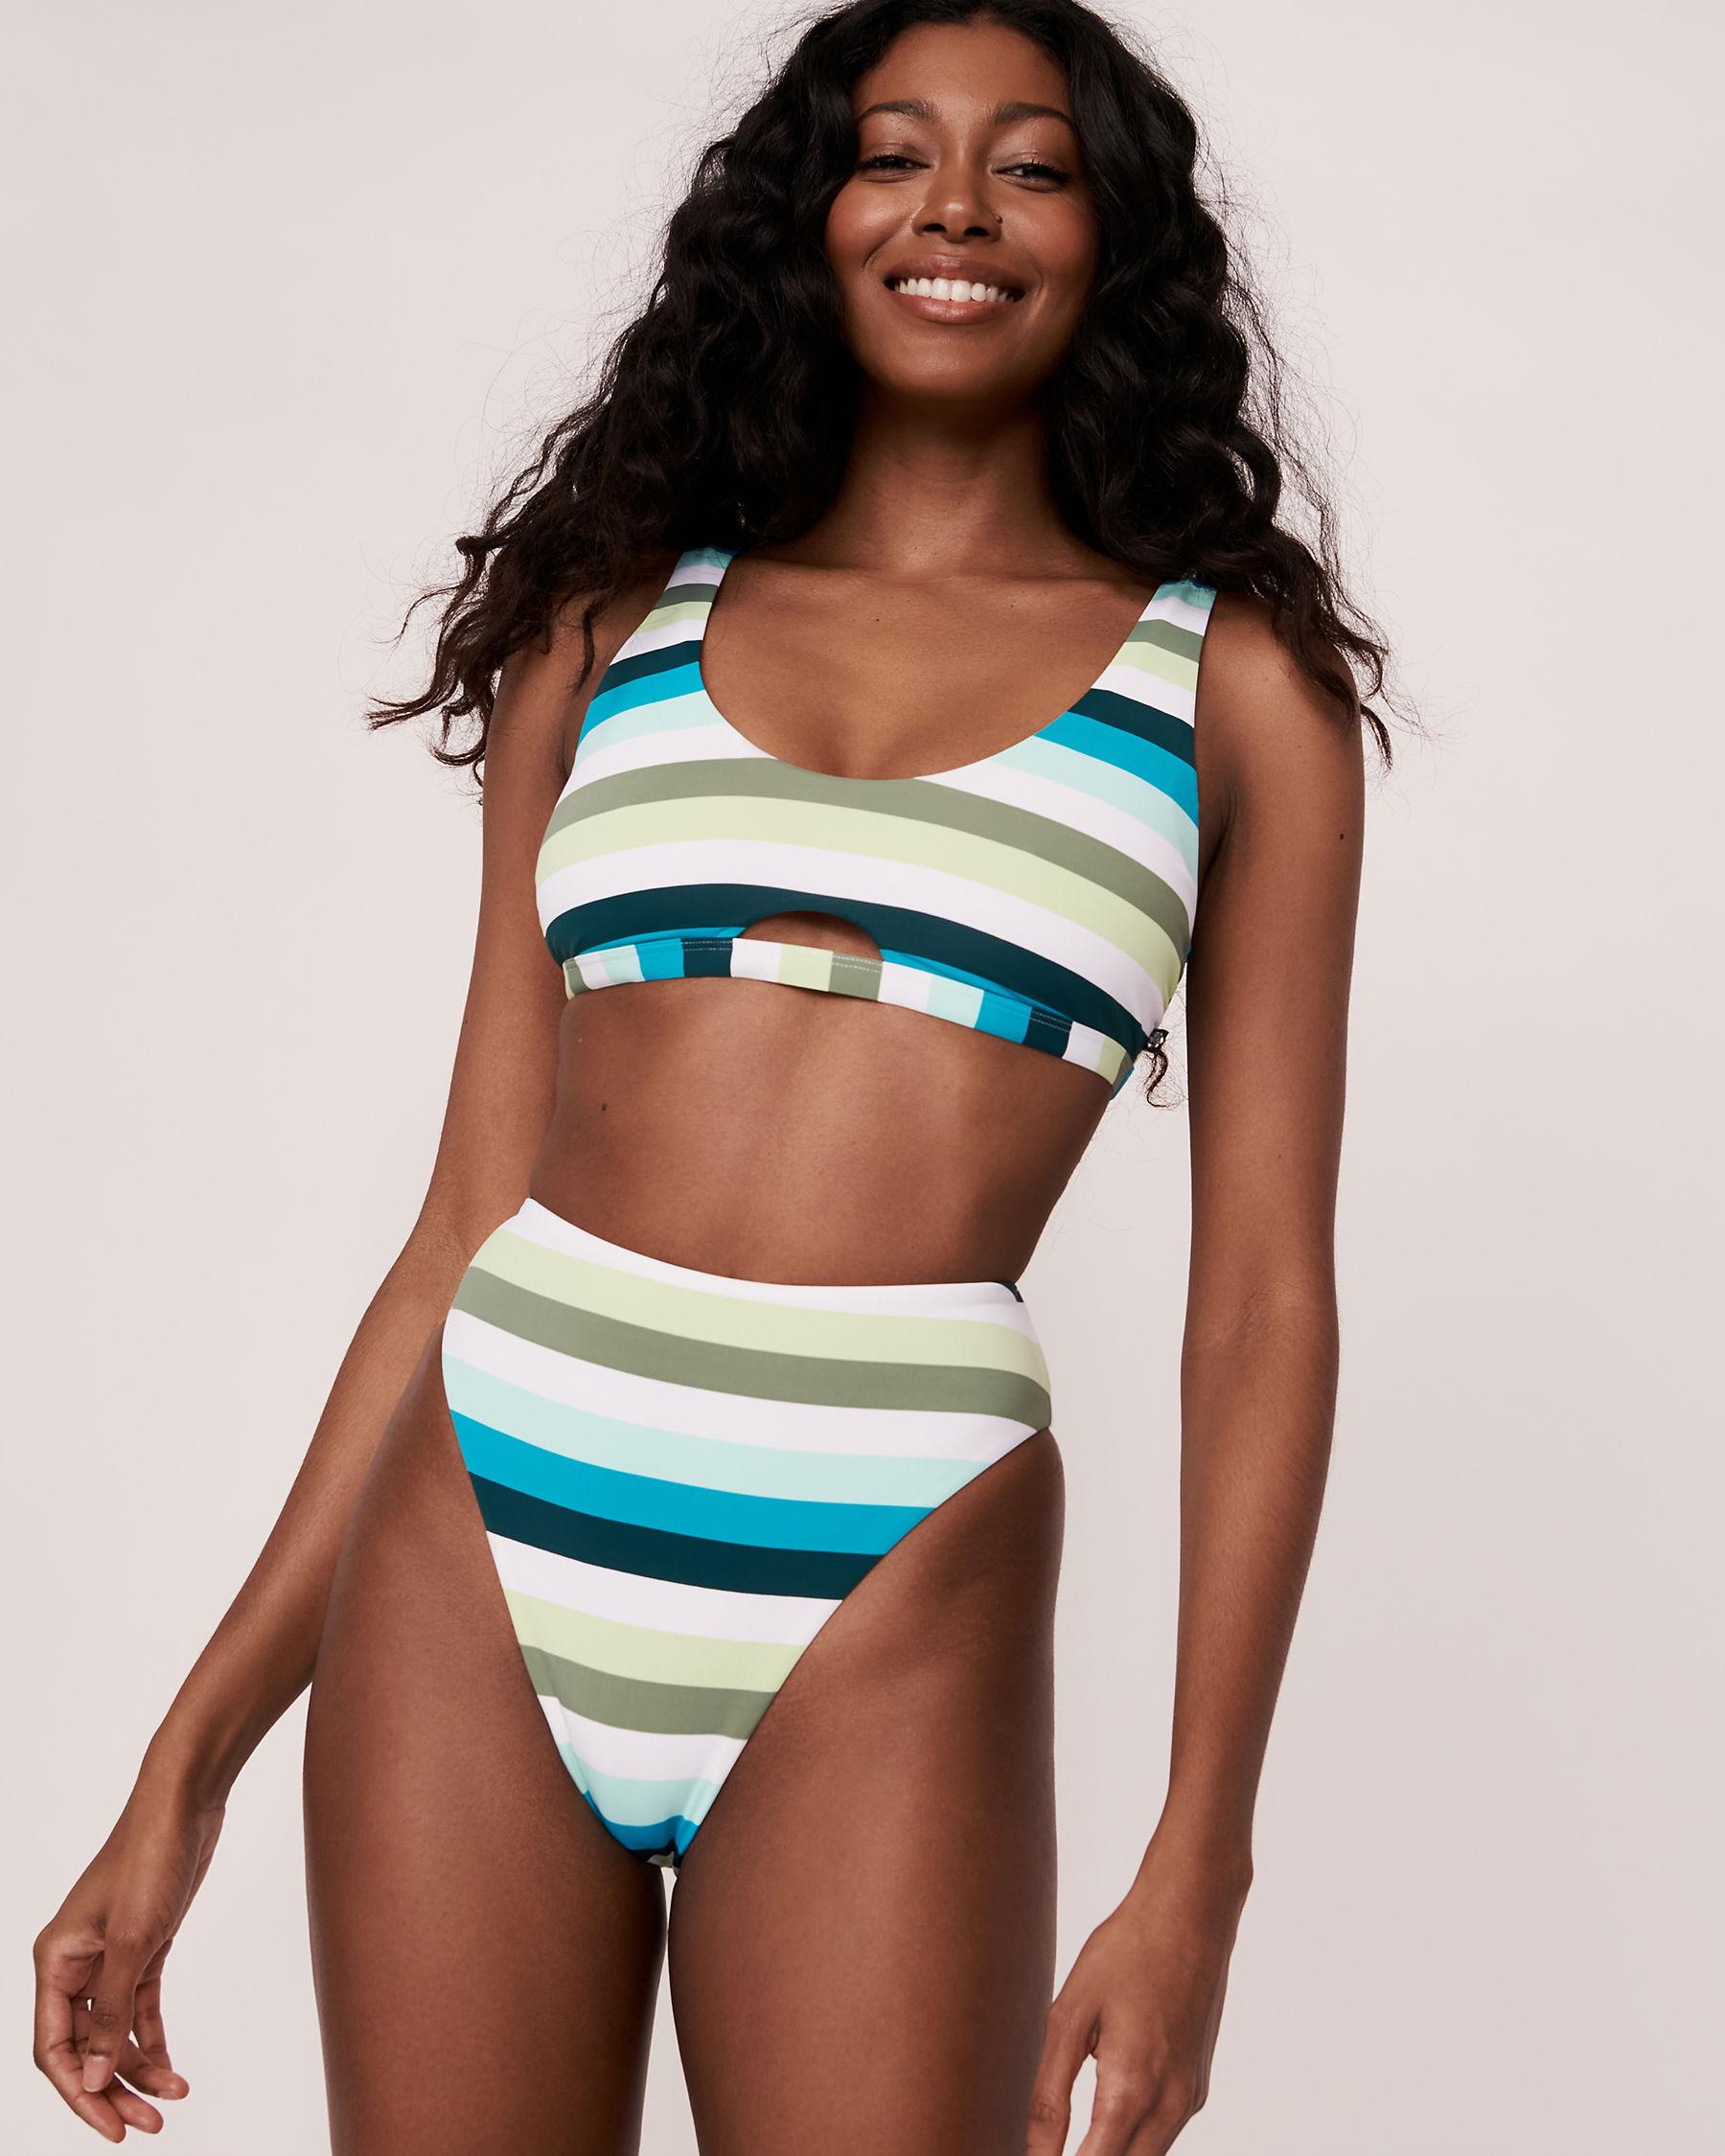 LA VIE EN ROSE AQUA Bas de bikini tanga taille haute LAGOON Tons de bleu 70300092 - Voir3